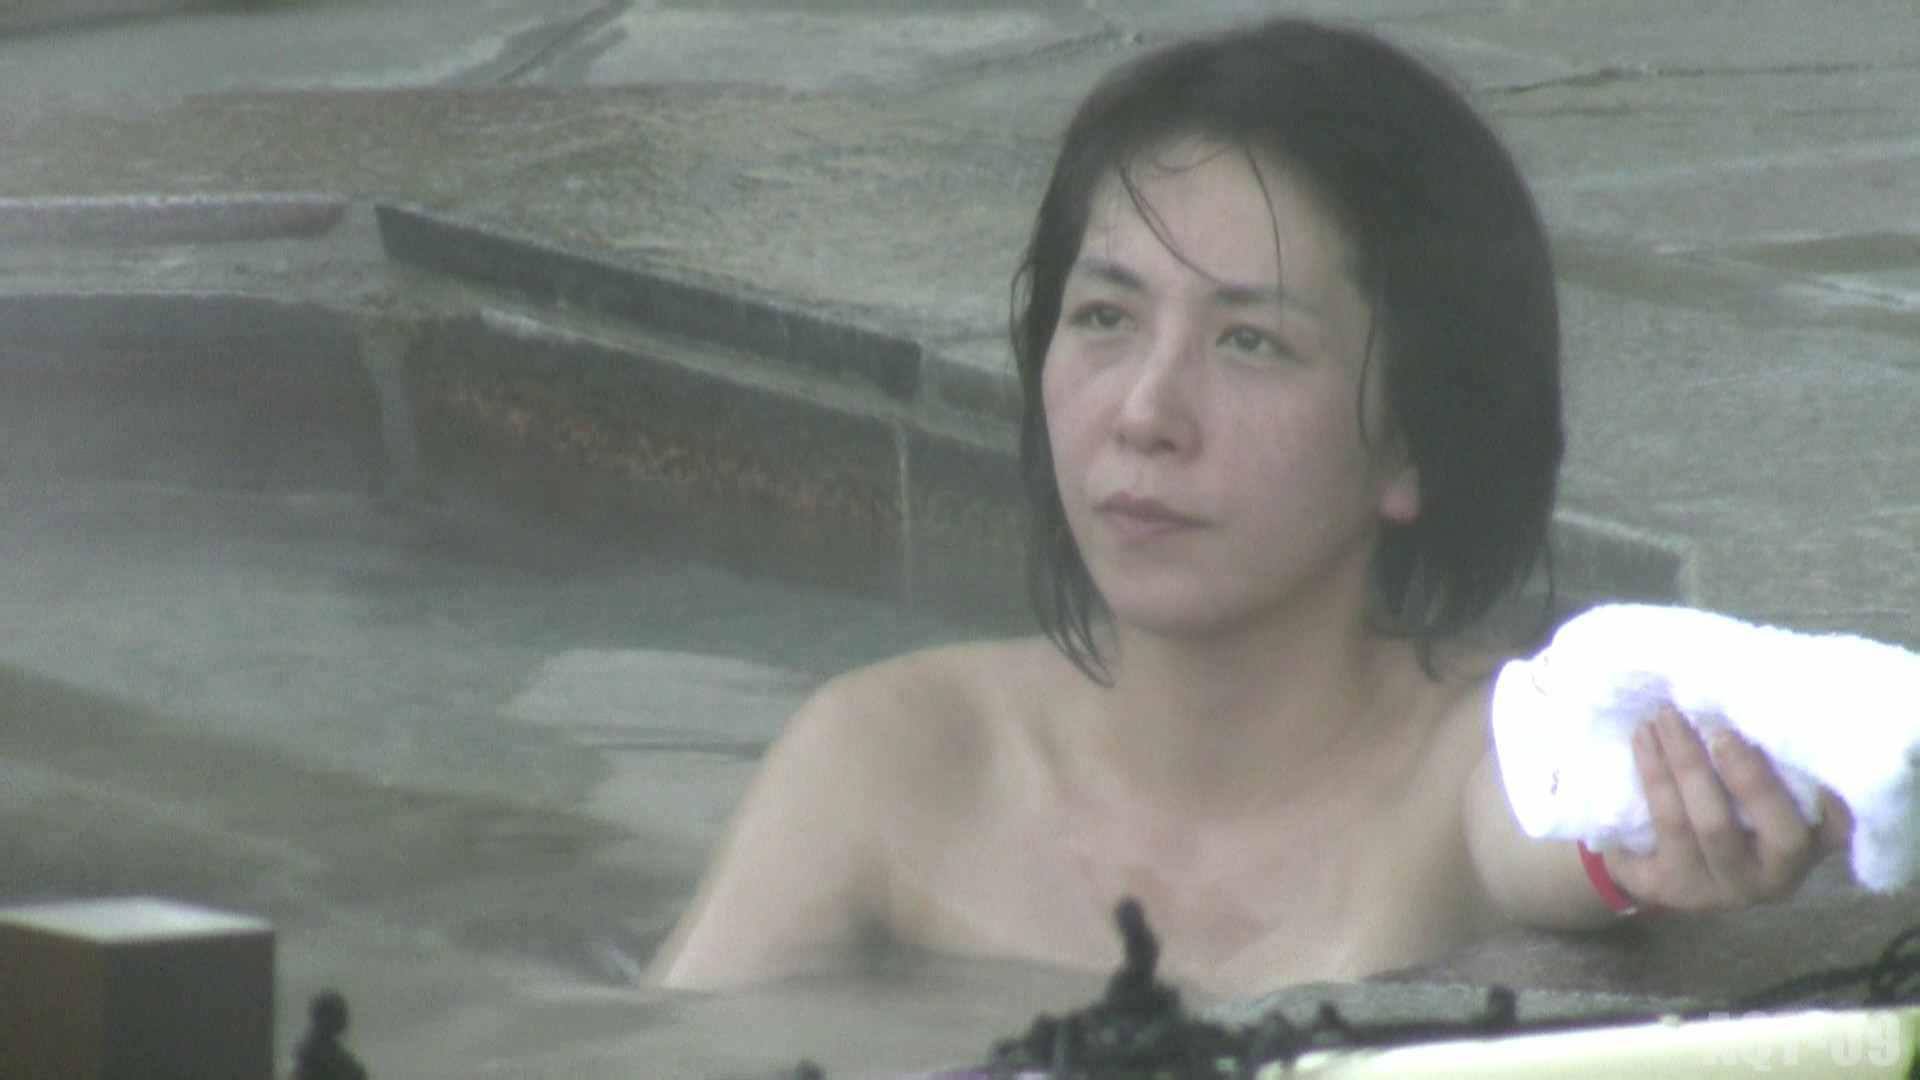 Aquaな露天風呂Vol.788 OL女体 セックス無修正動画無料 44連発 14